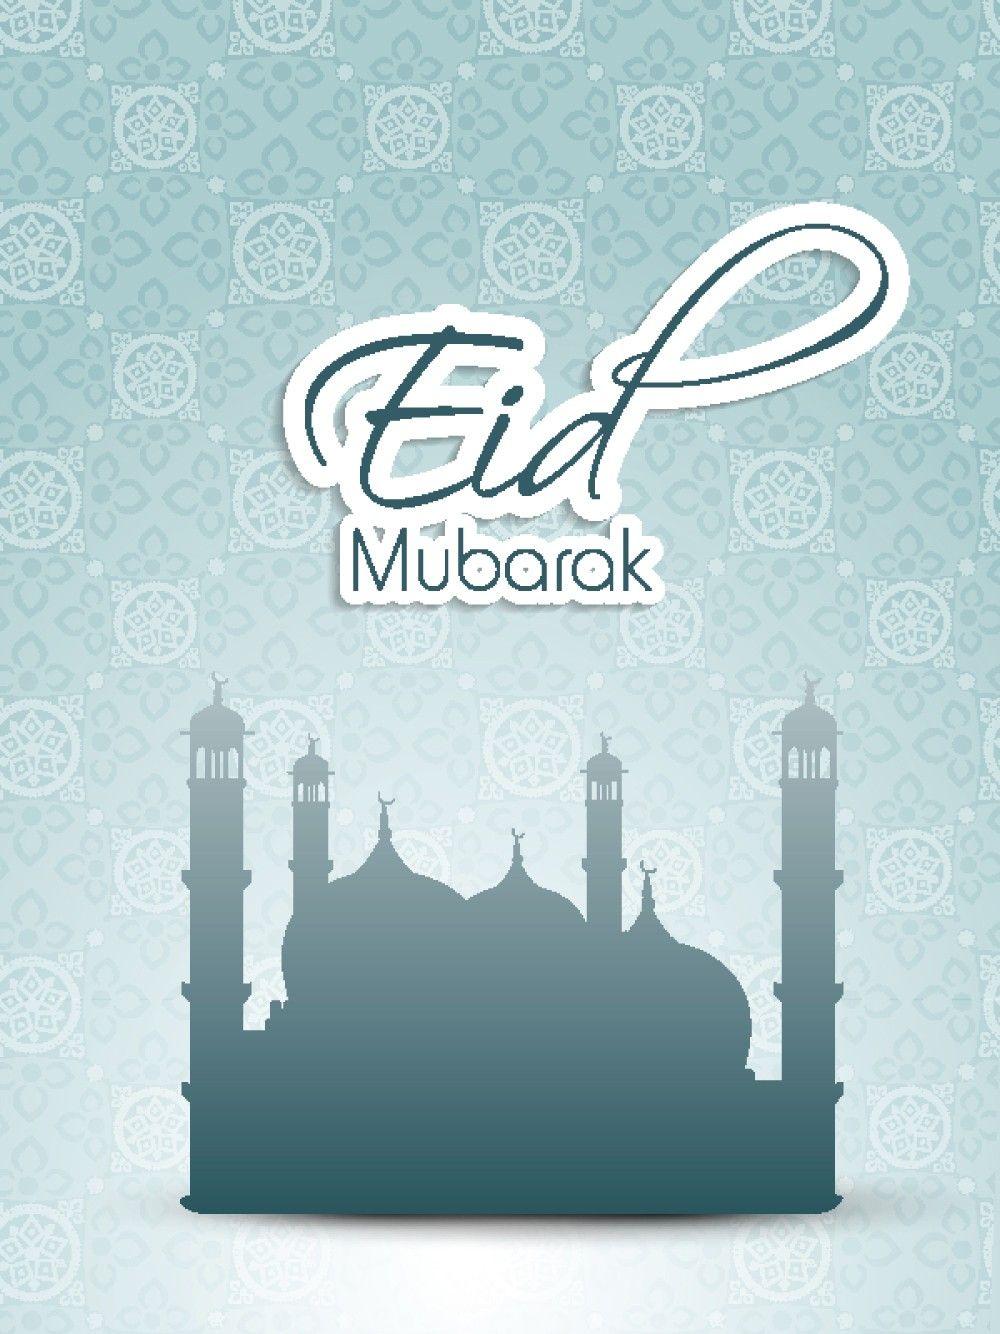 Happy Eid Ul Adha Mubarak Images Wallpapers Cards 11 Happy